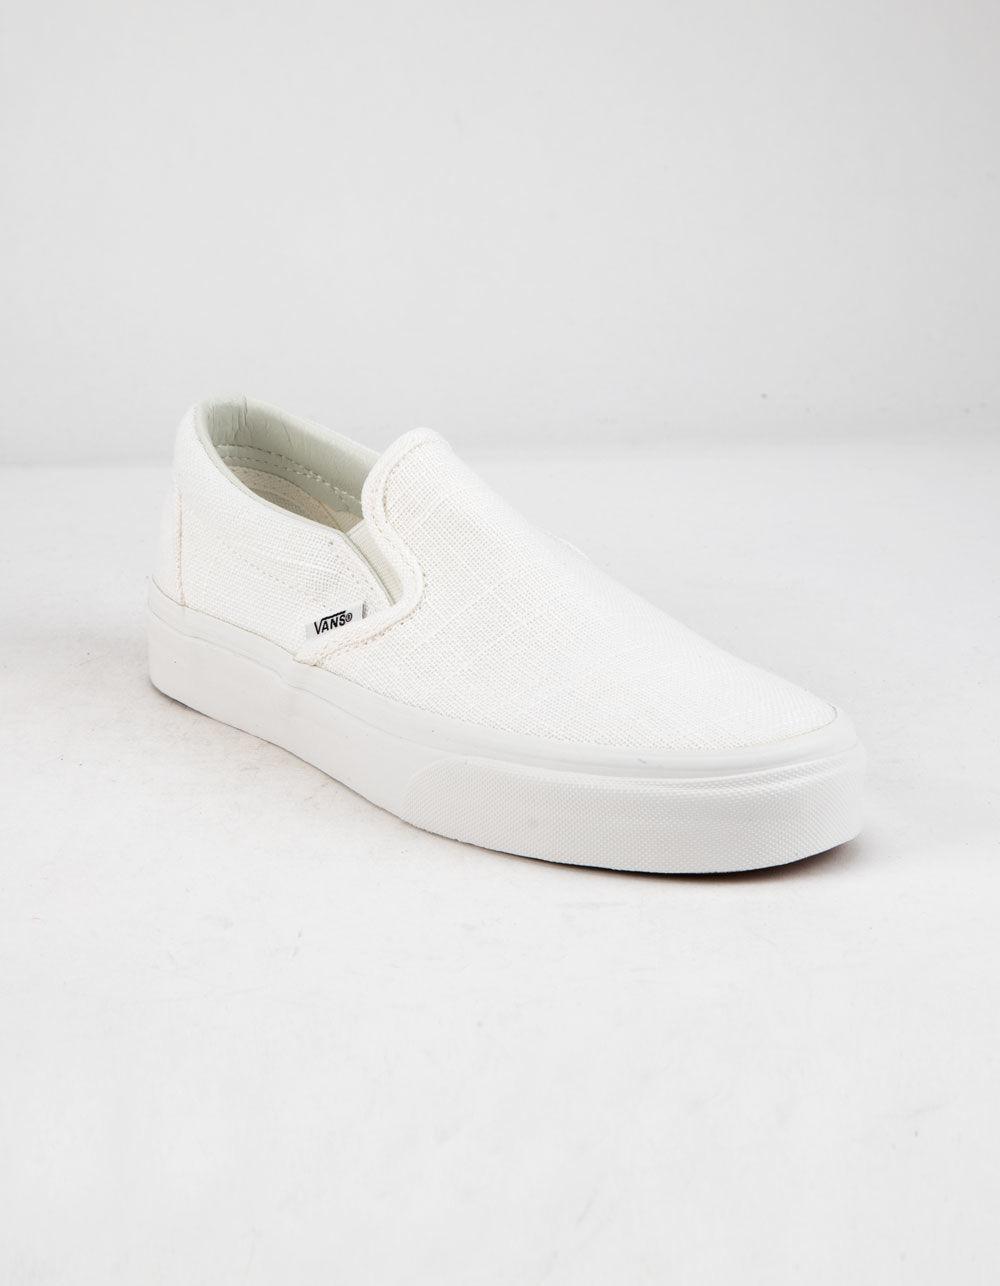 b824d84bbdb484 Lyst - Vans Hemp Linen Slip-on Blanc De Blanc Womens Shoes in White